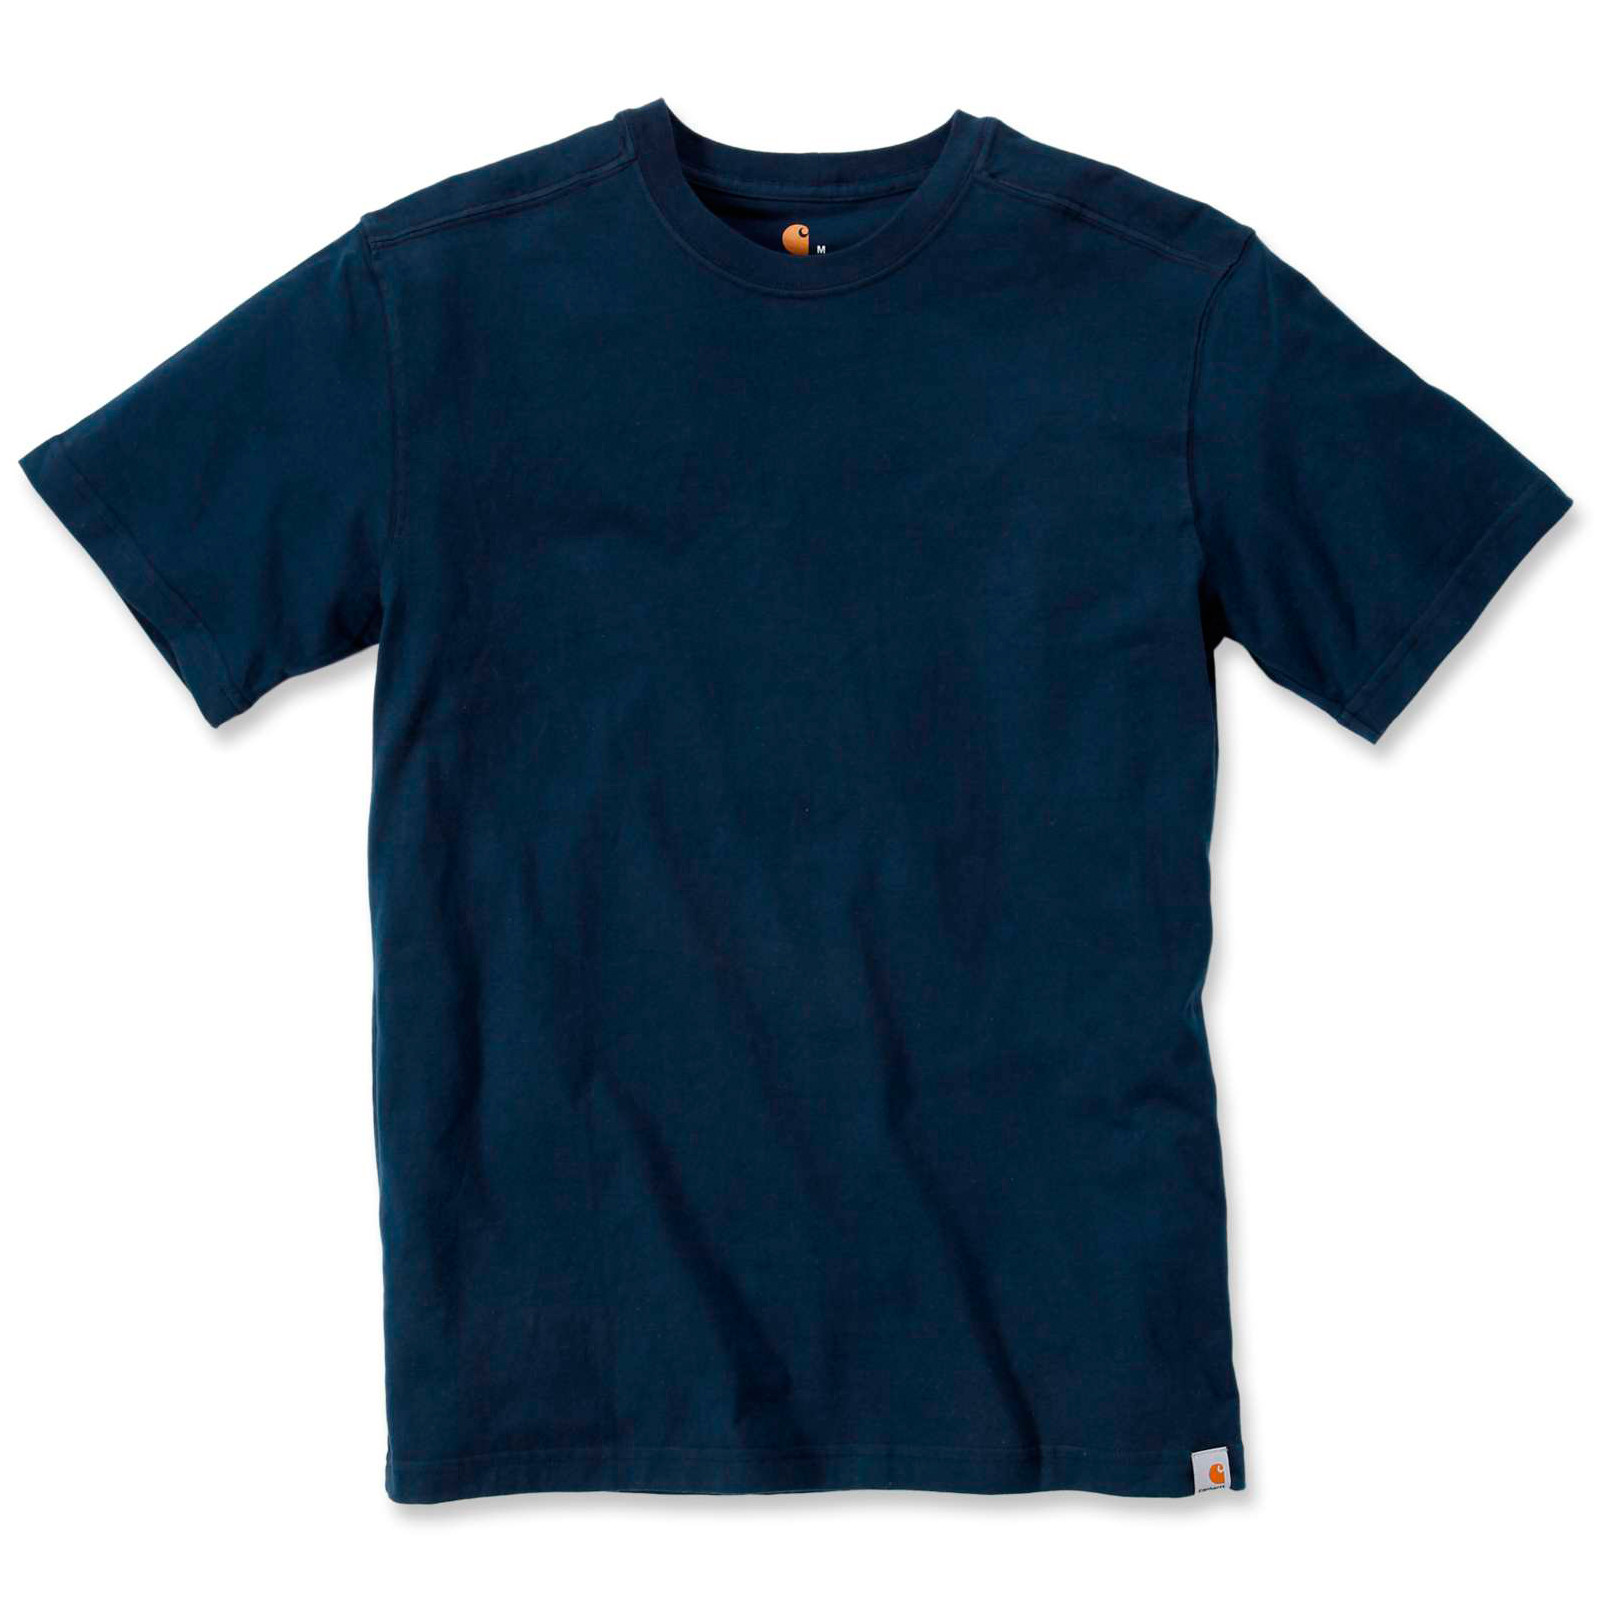 Футболка Carhartt Maddock T-Shirt S/S - 101124 (Navy, XS)